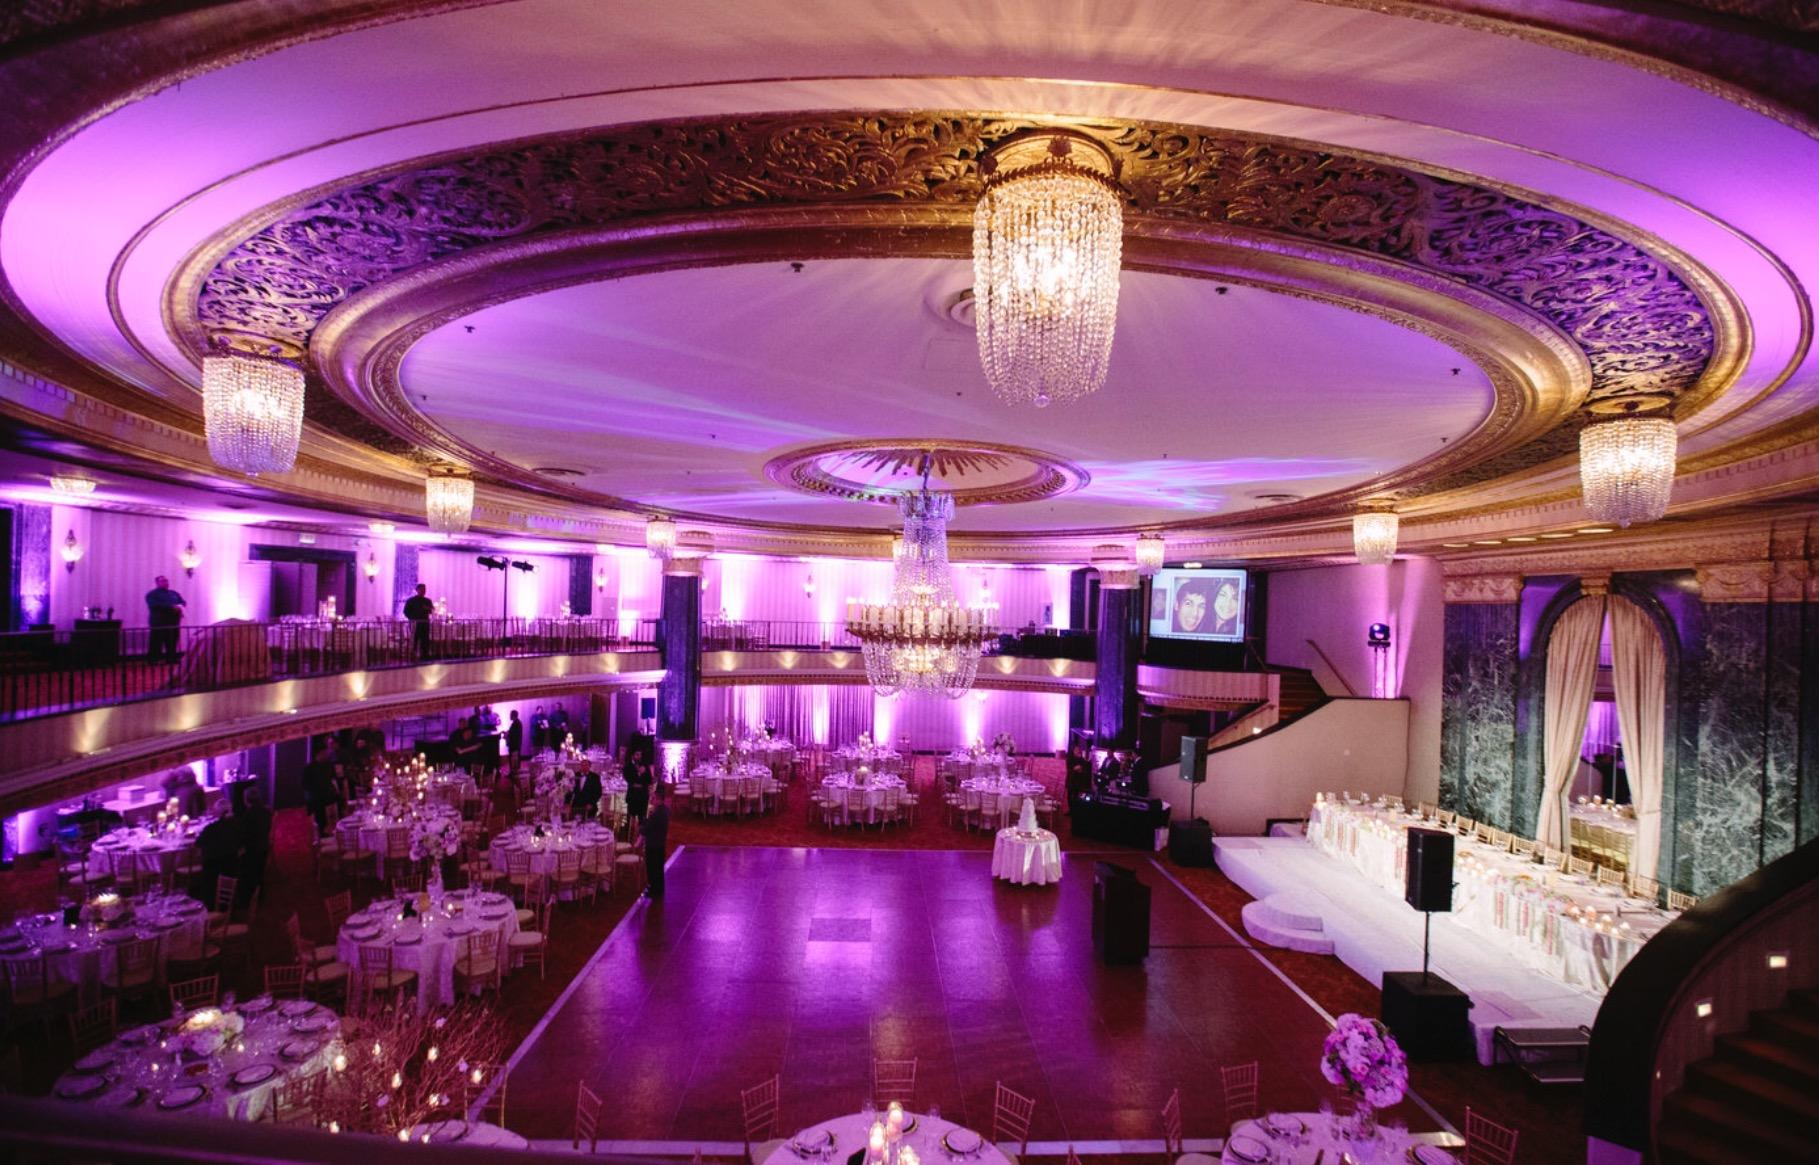 Intercontinental Chicago Ballroom